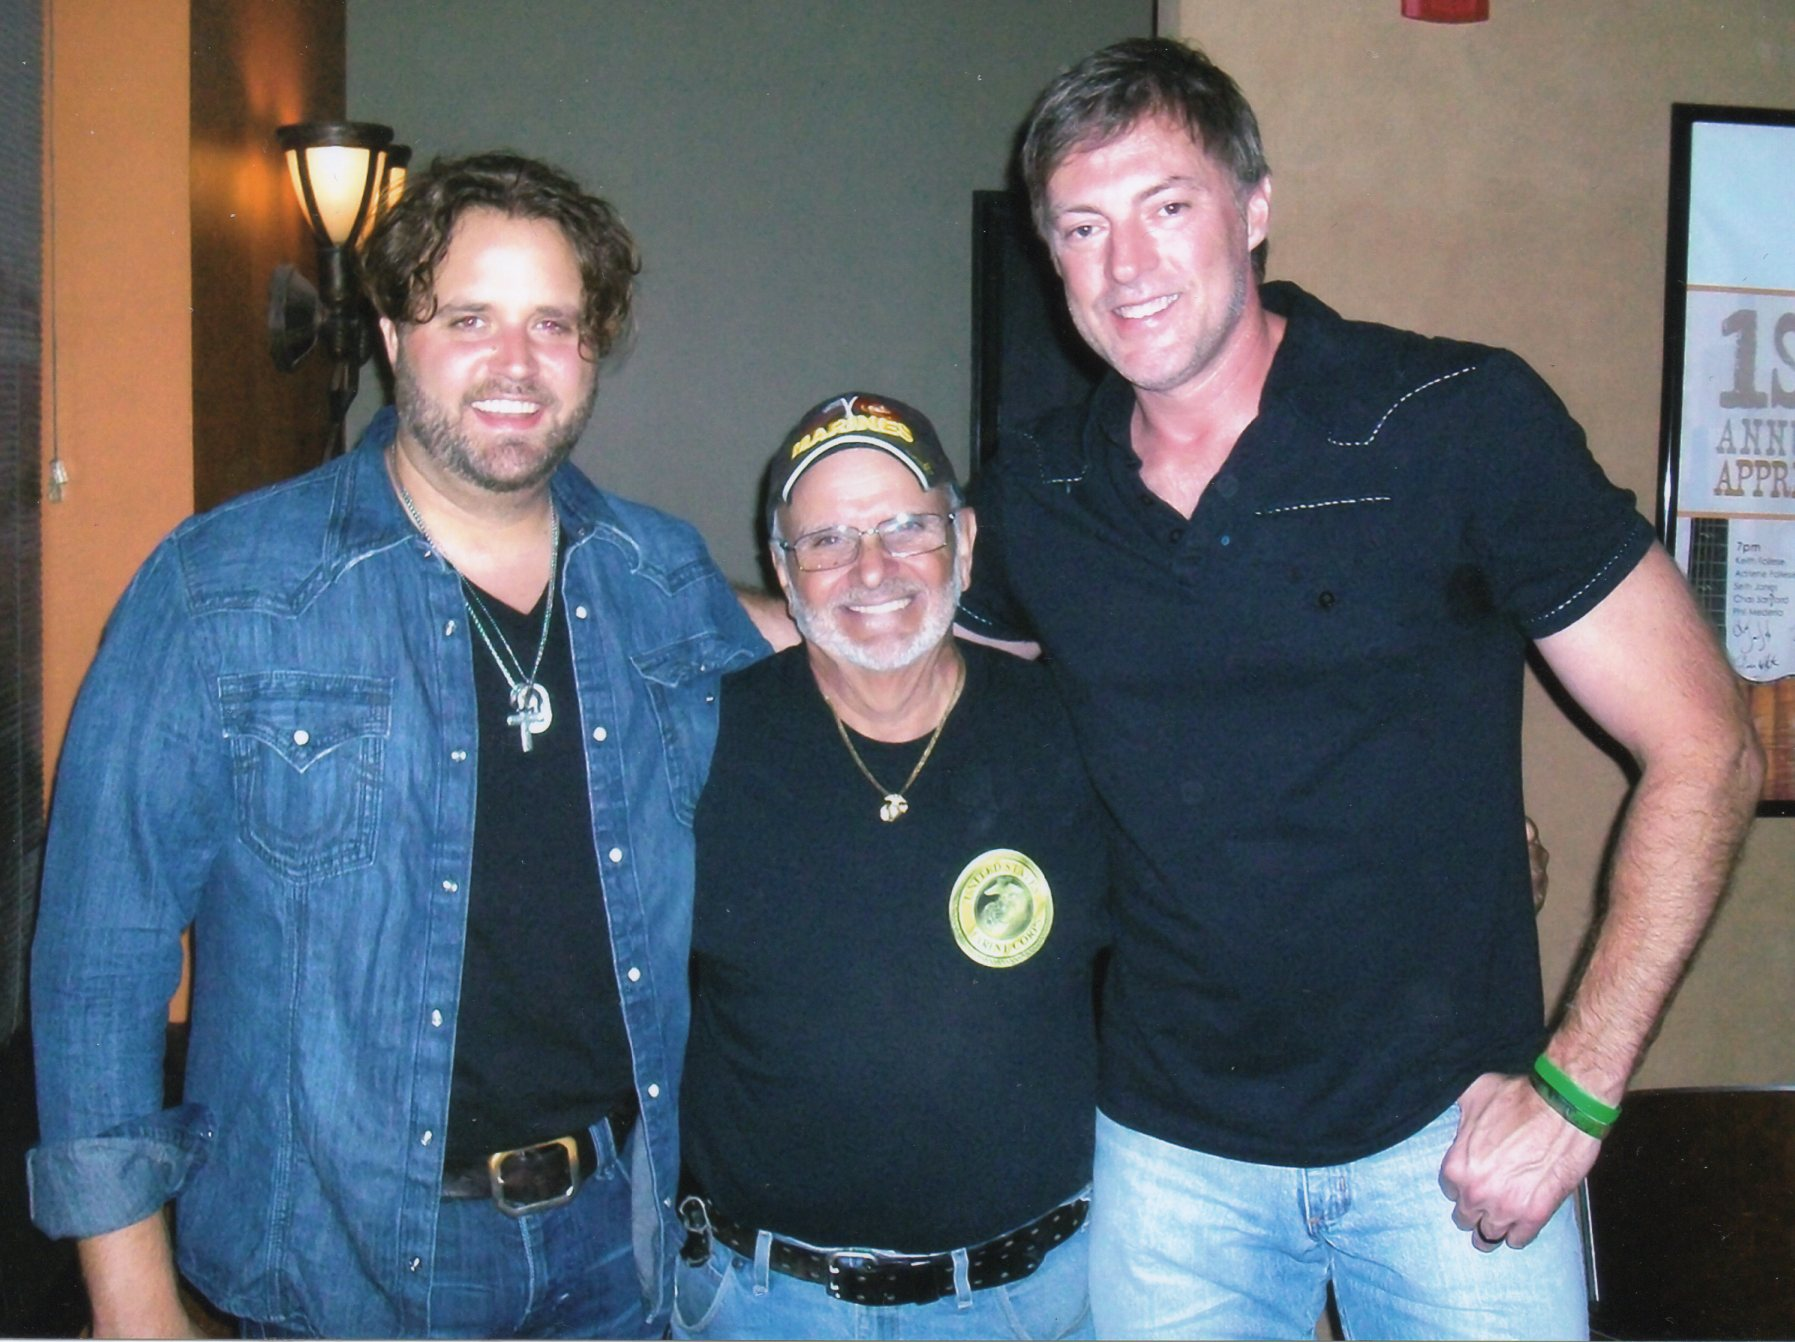 Randy Houser & Darryl Worley